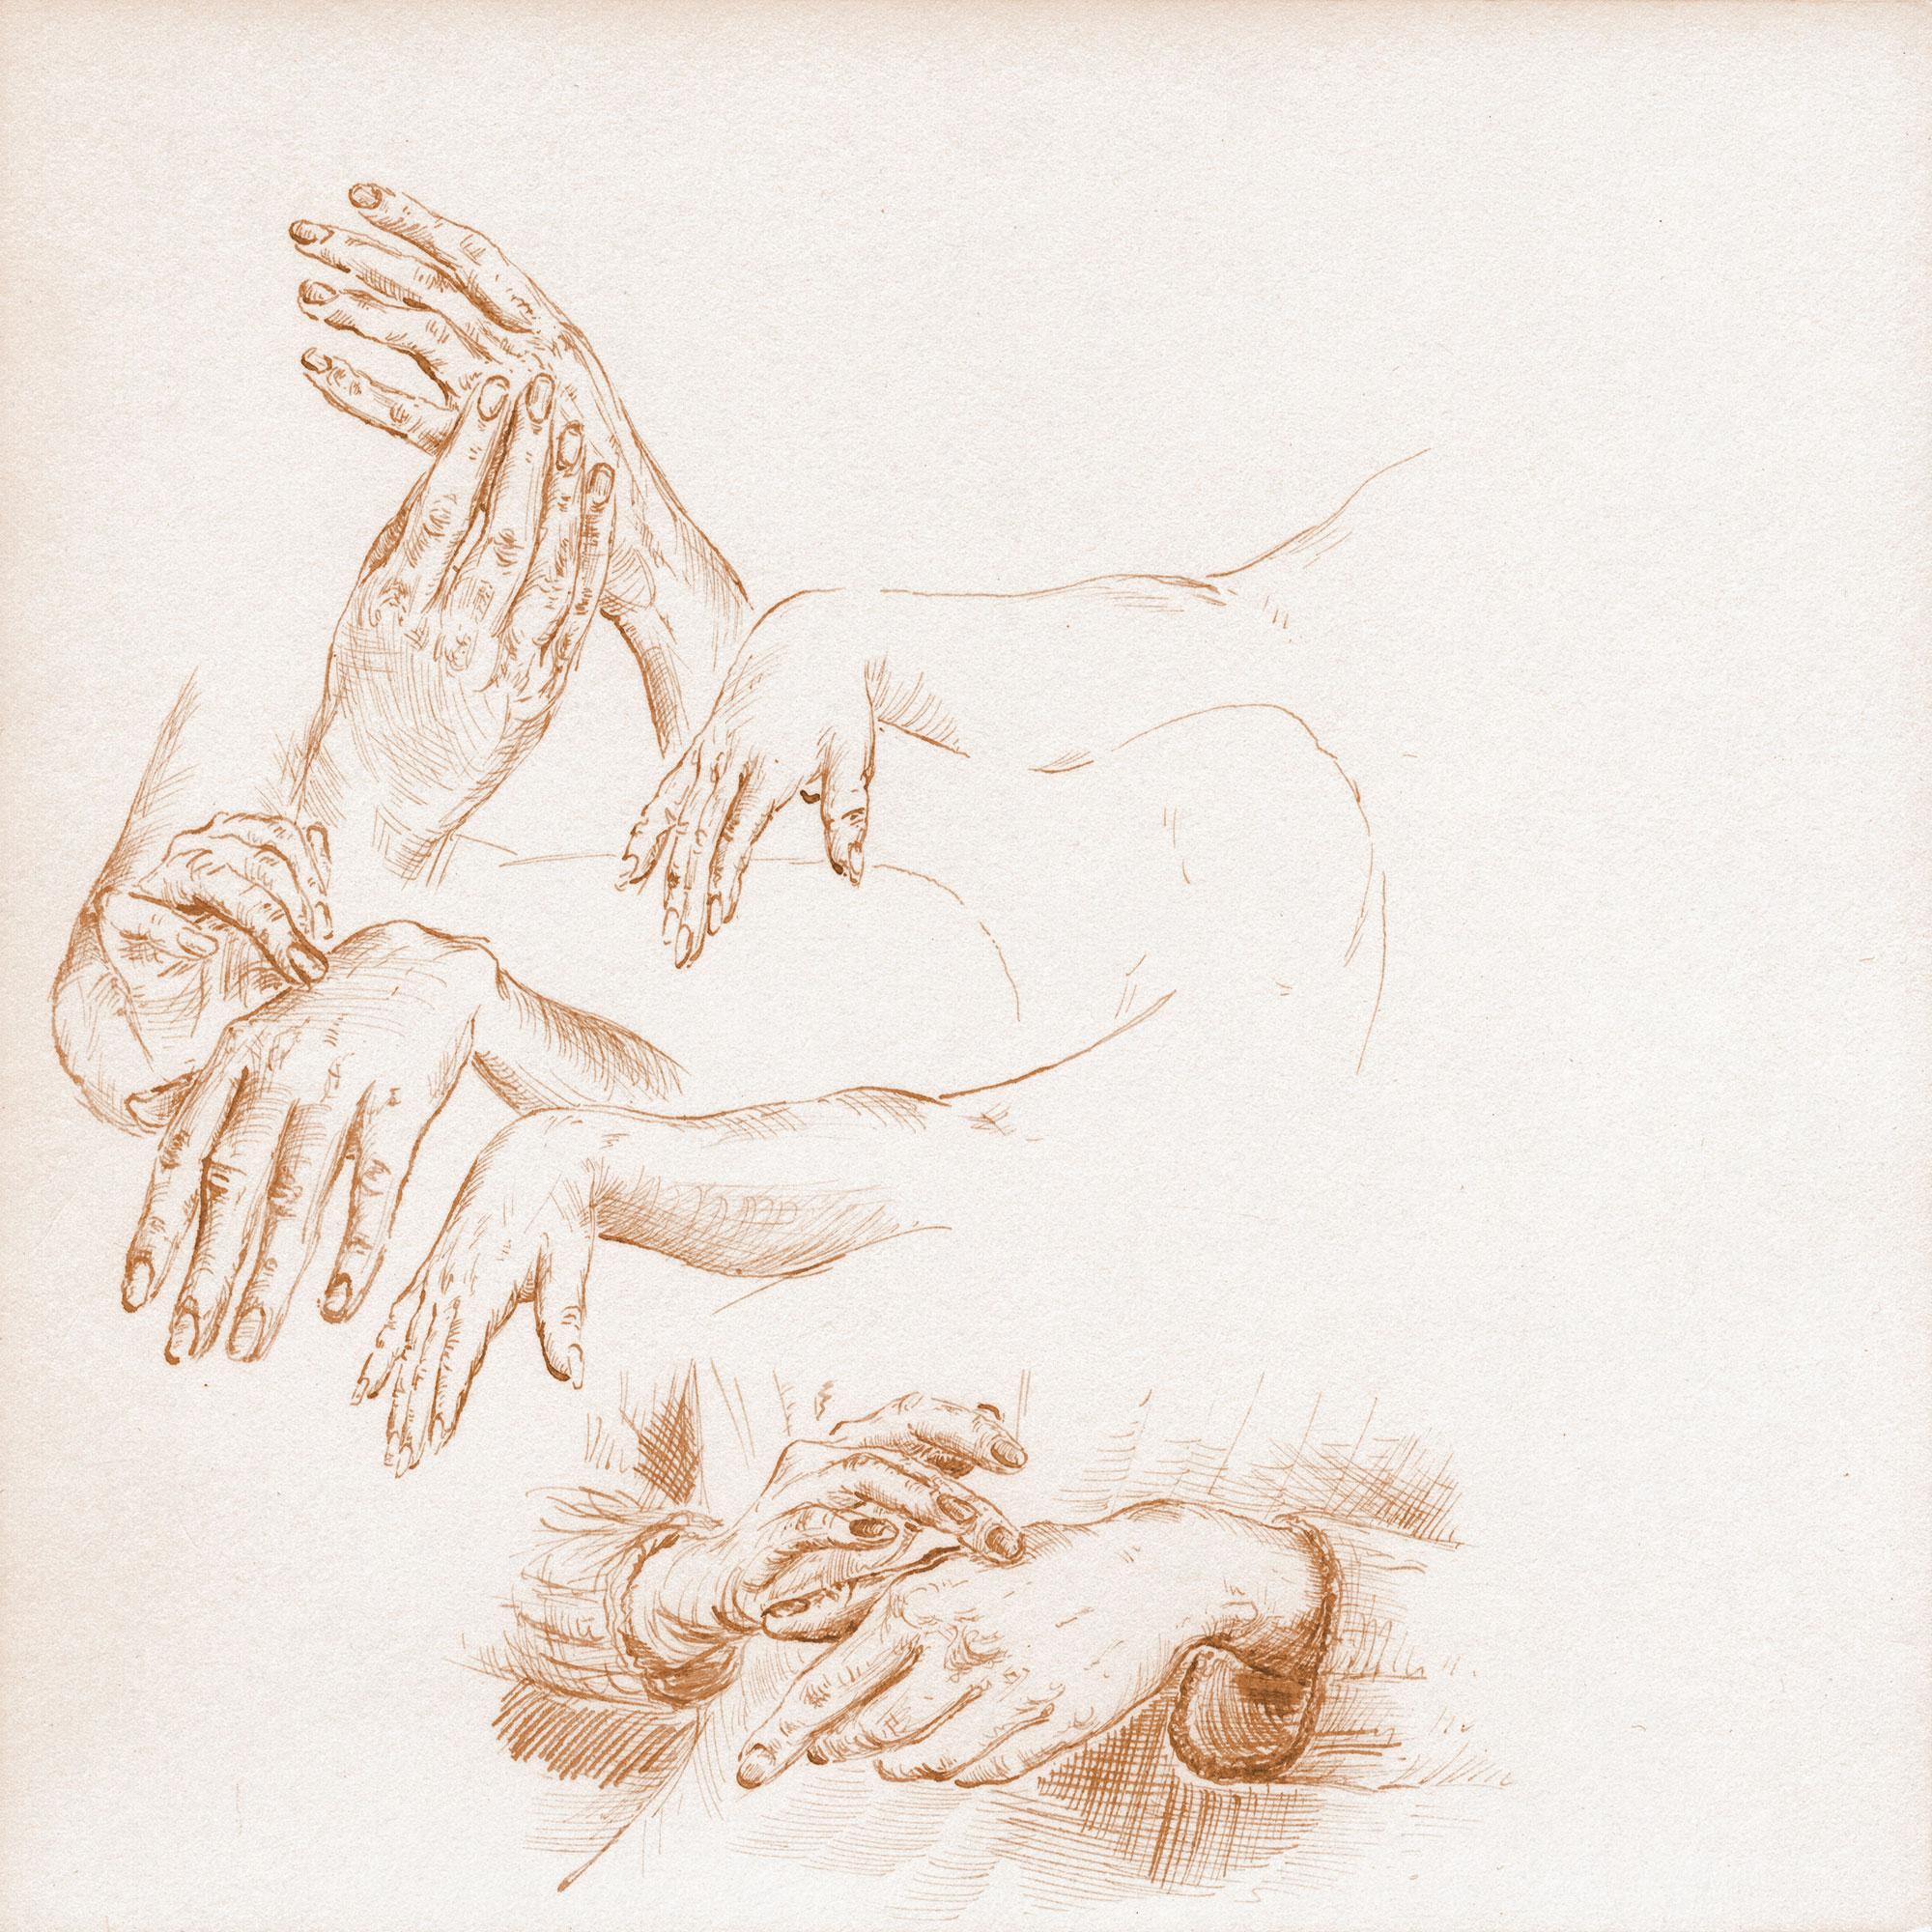 Hands in movement